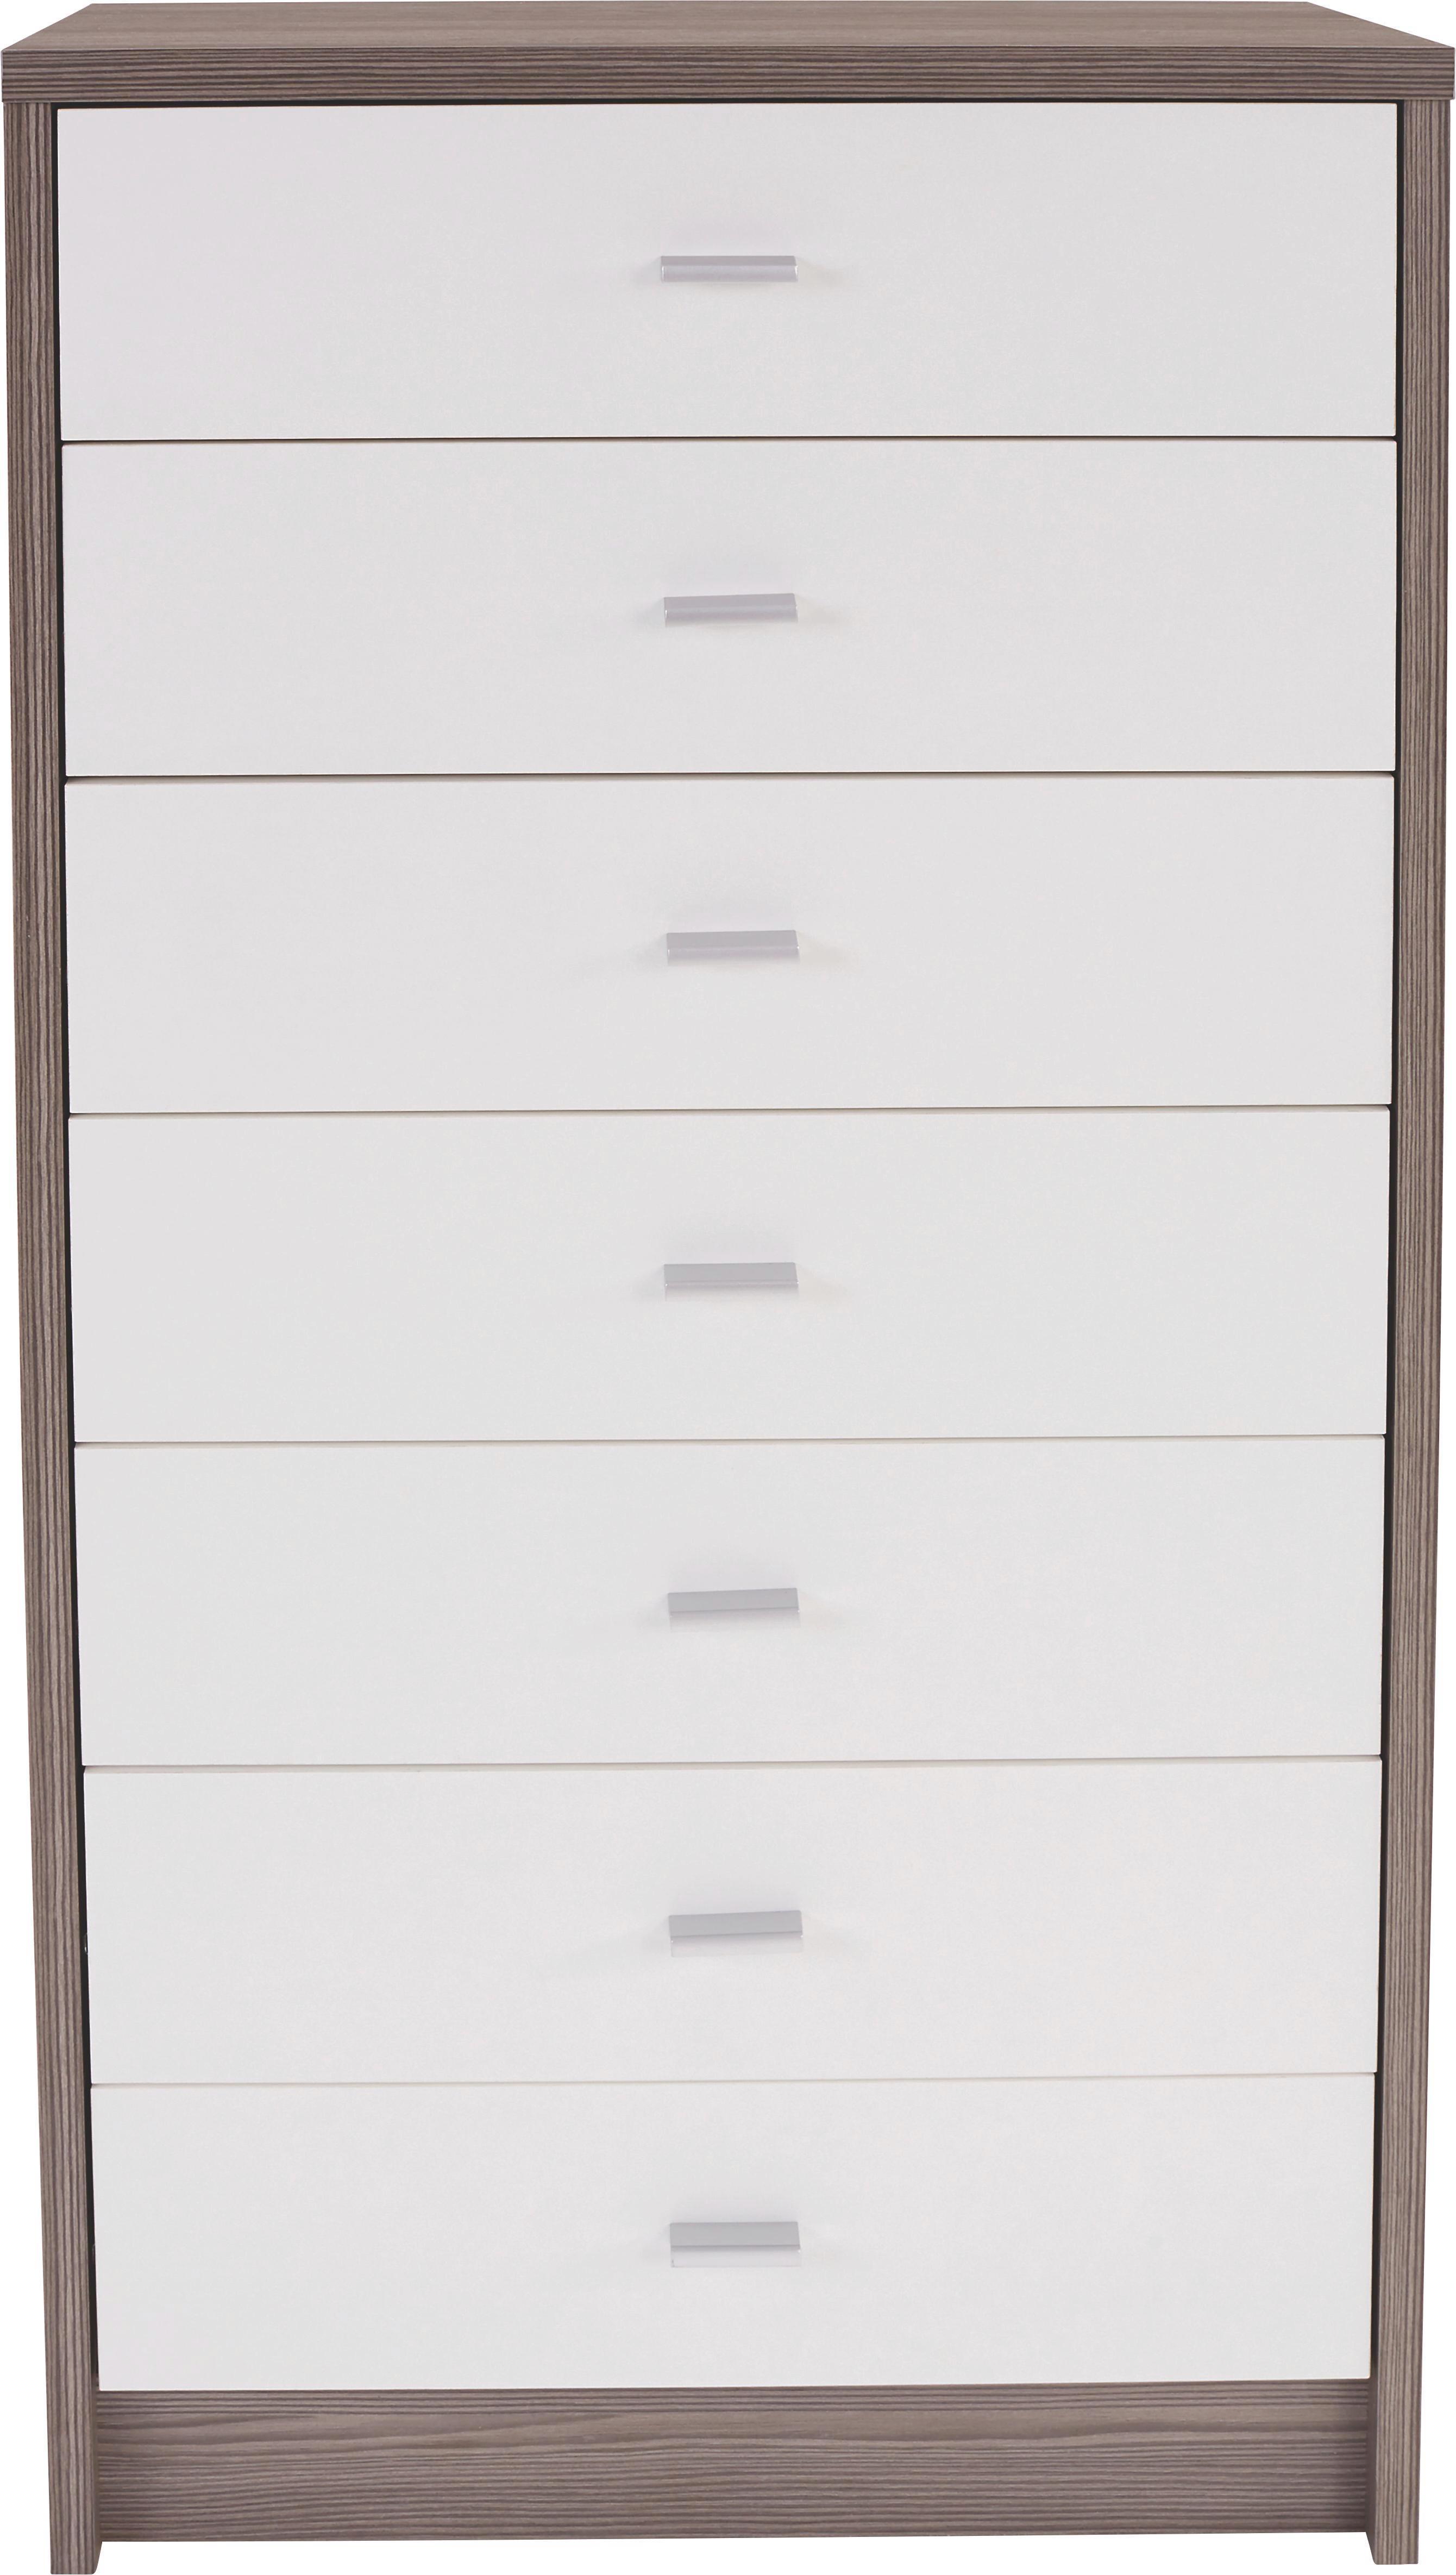 Komód 4-you - sötétbarna/fehér, modern, faanyagok (50/111,4/34,6cm)